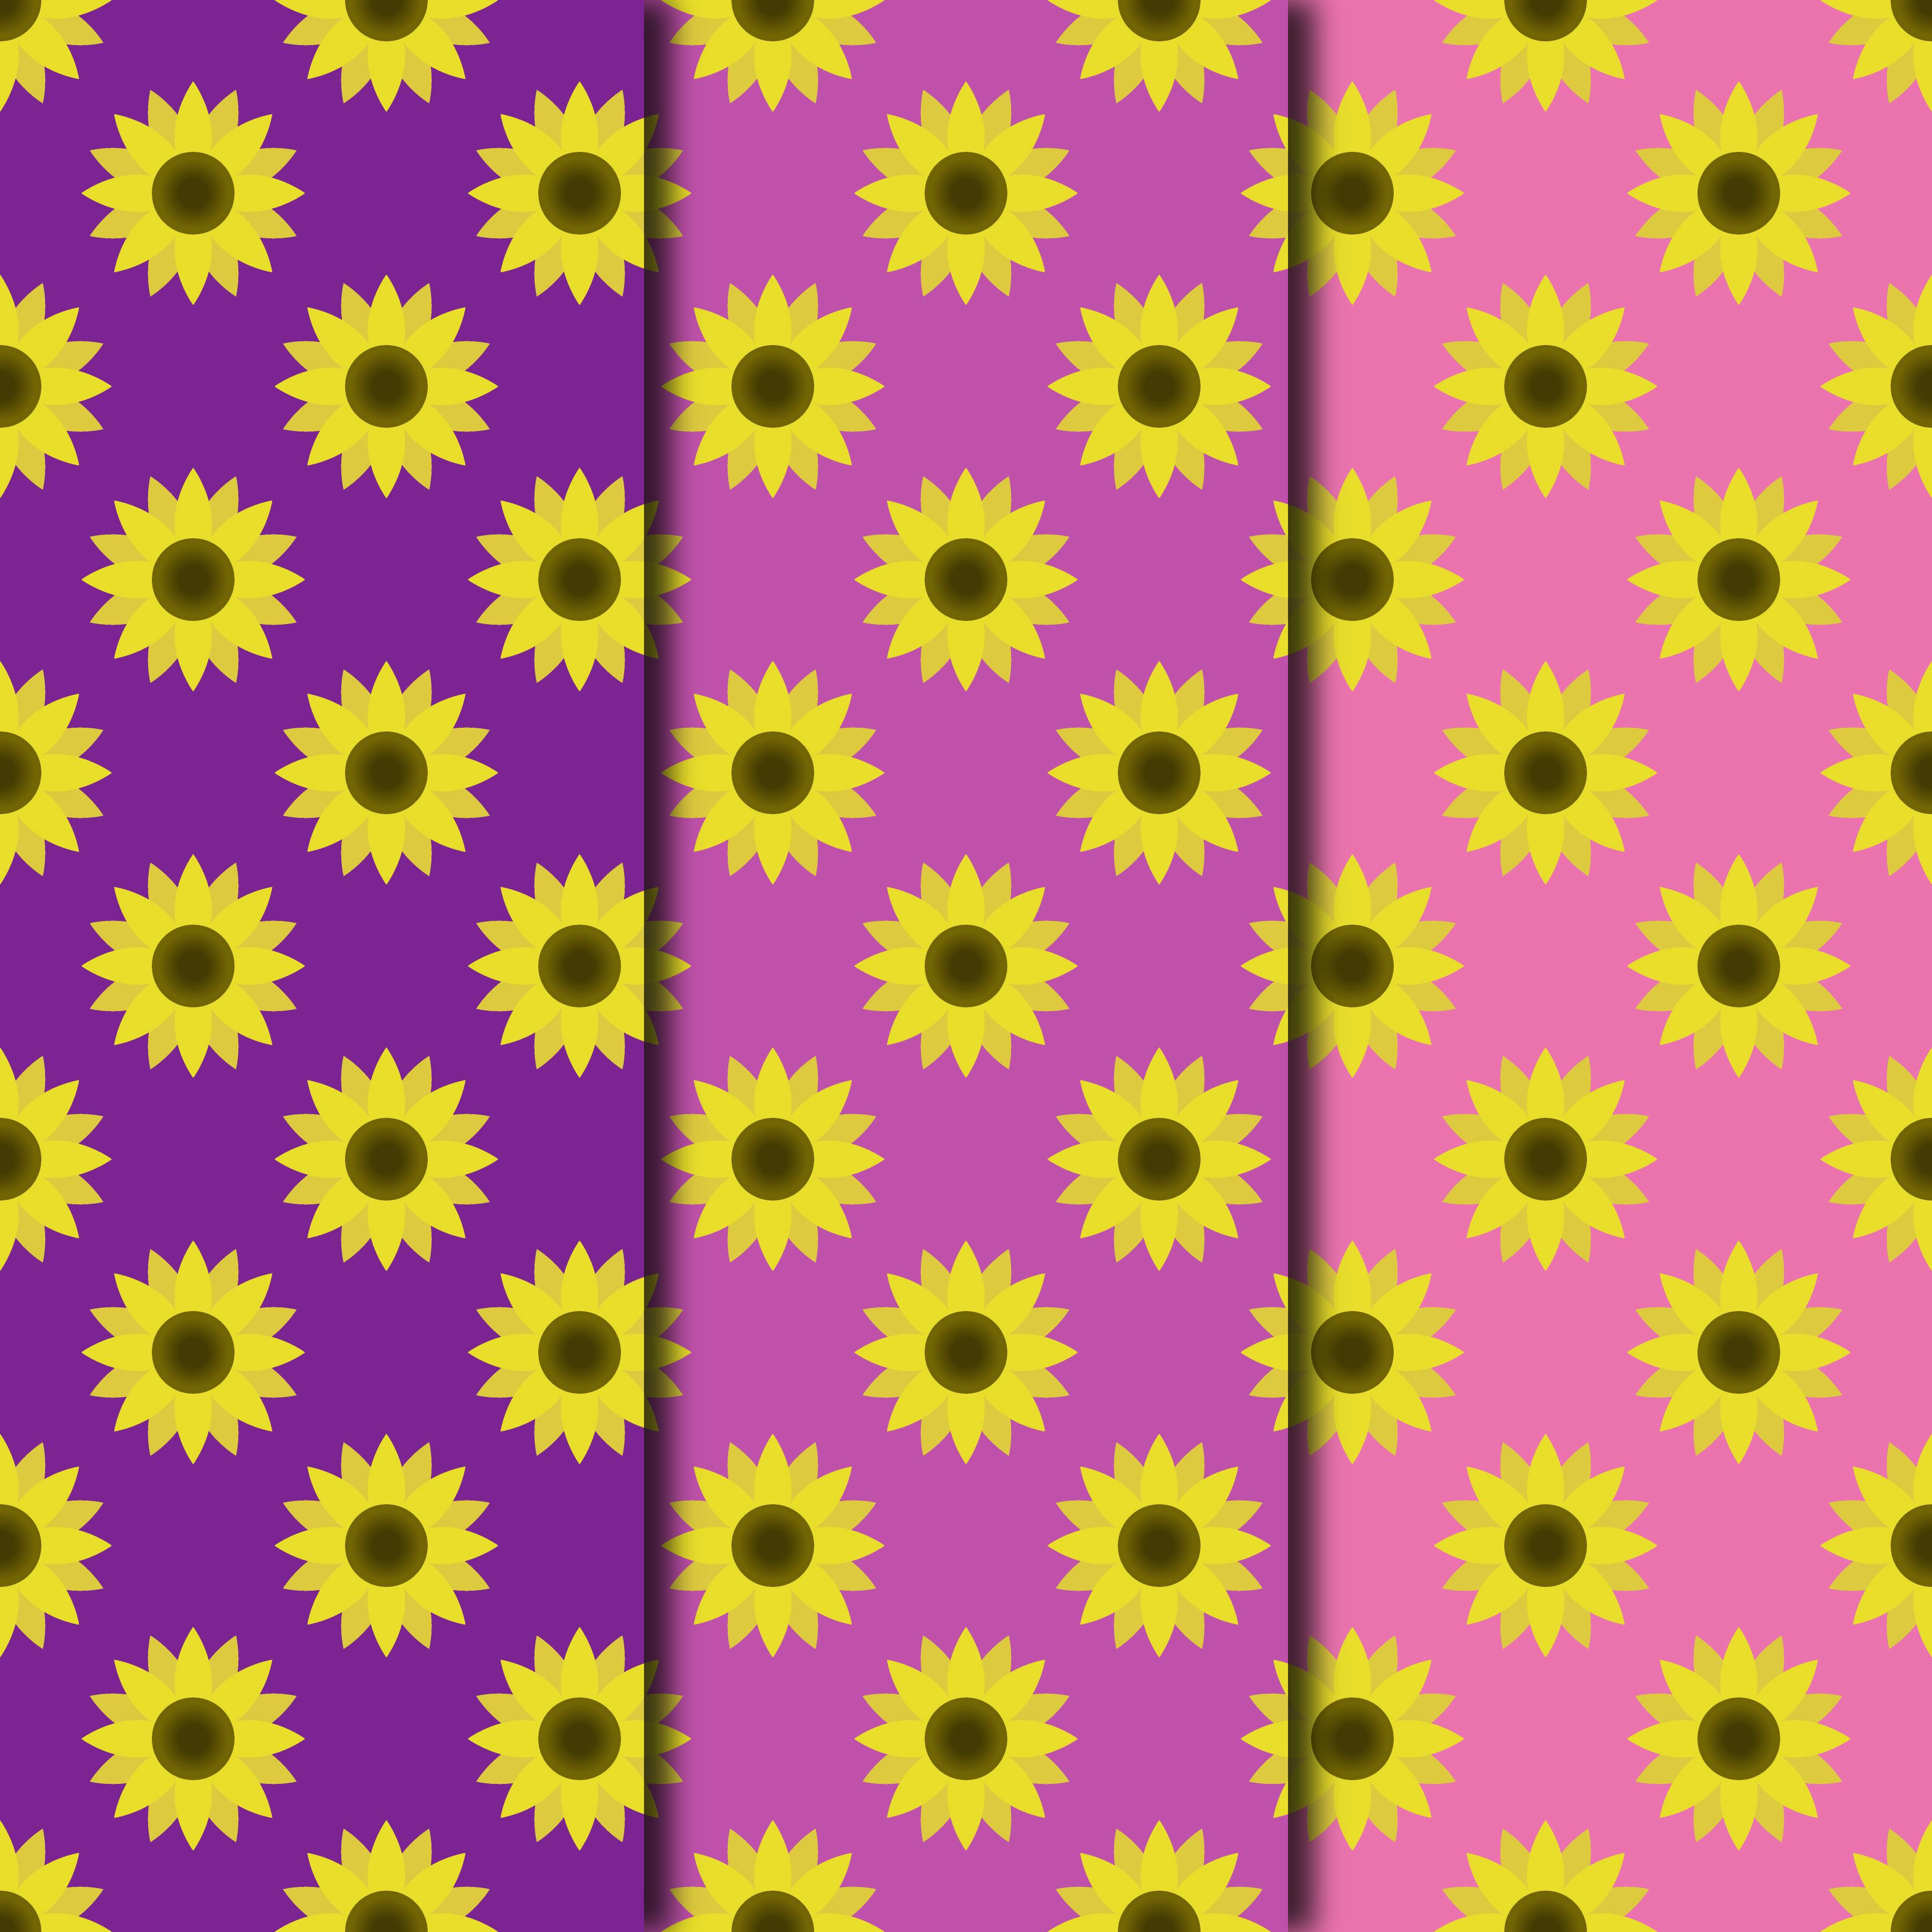 Blooming Sunflowers Digital Paper example image 3